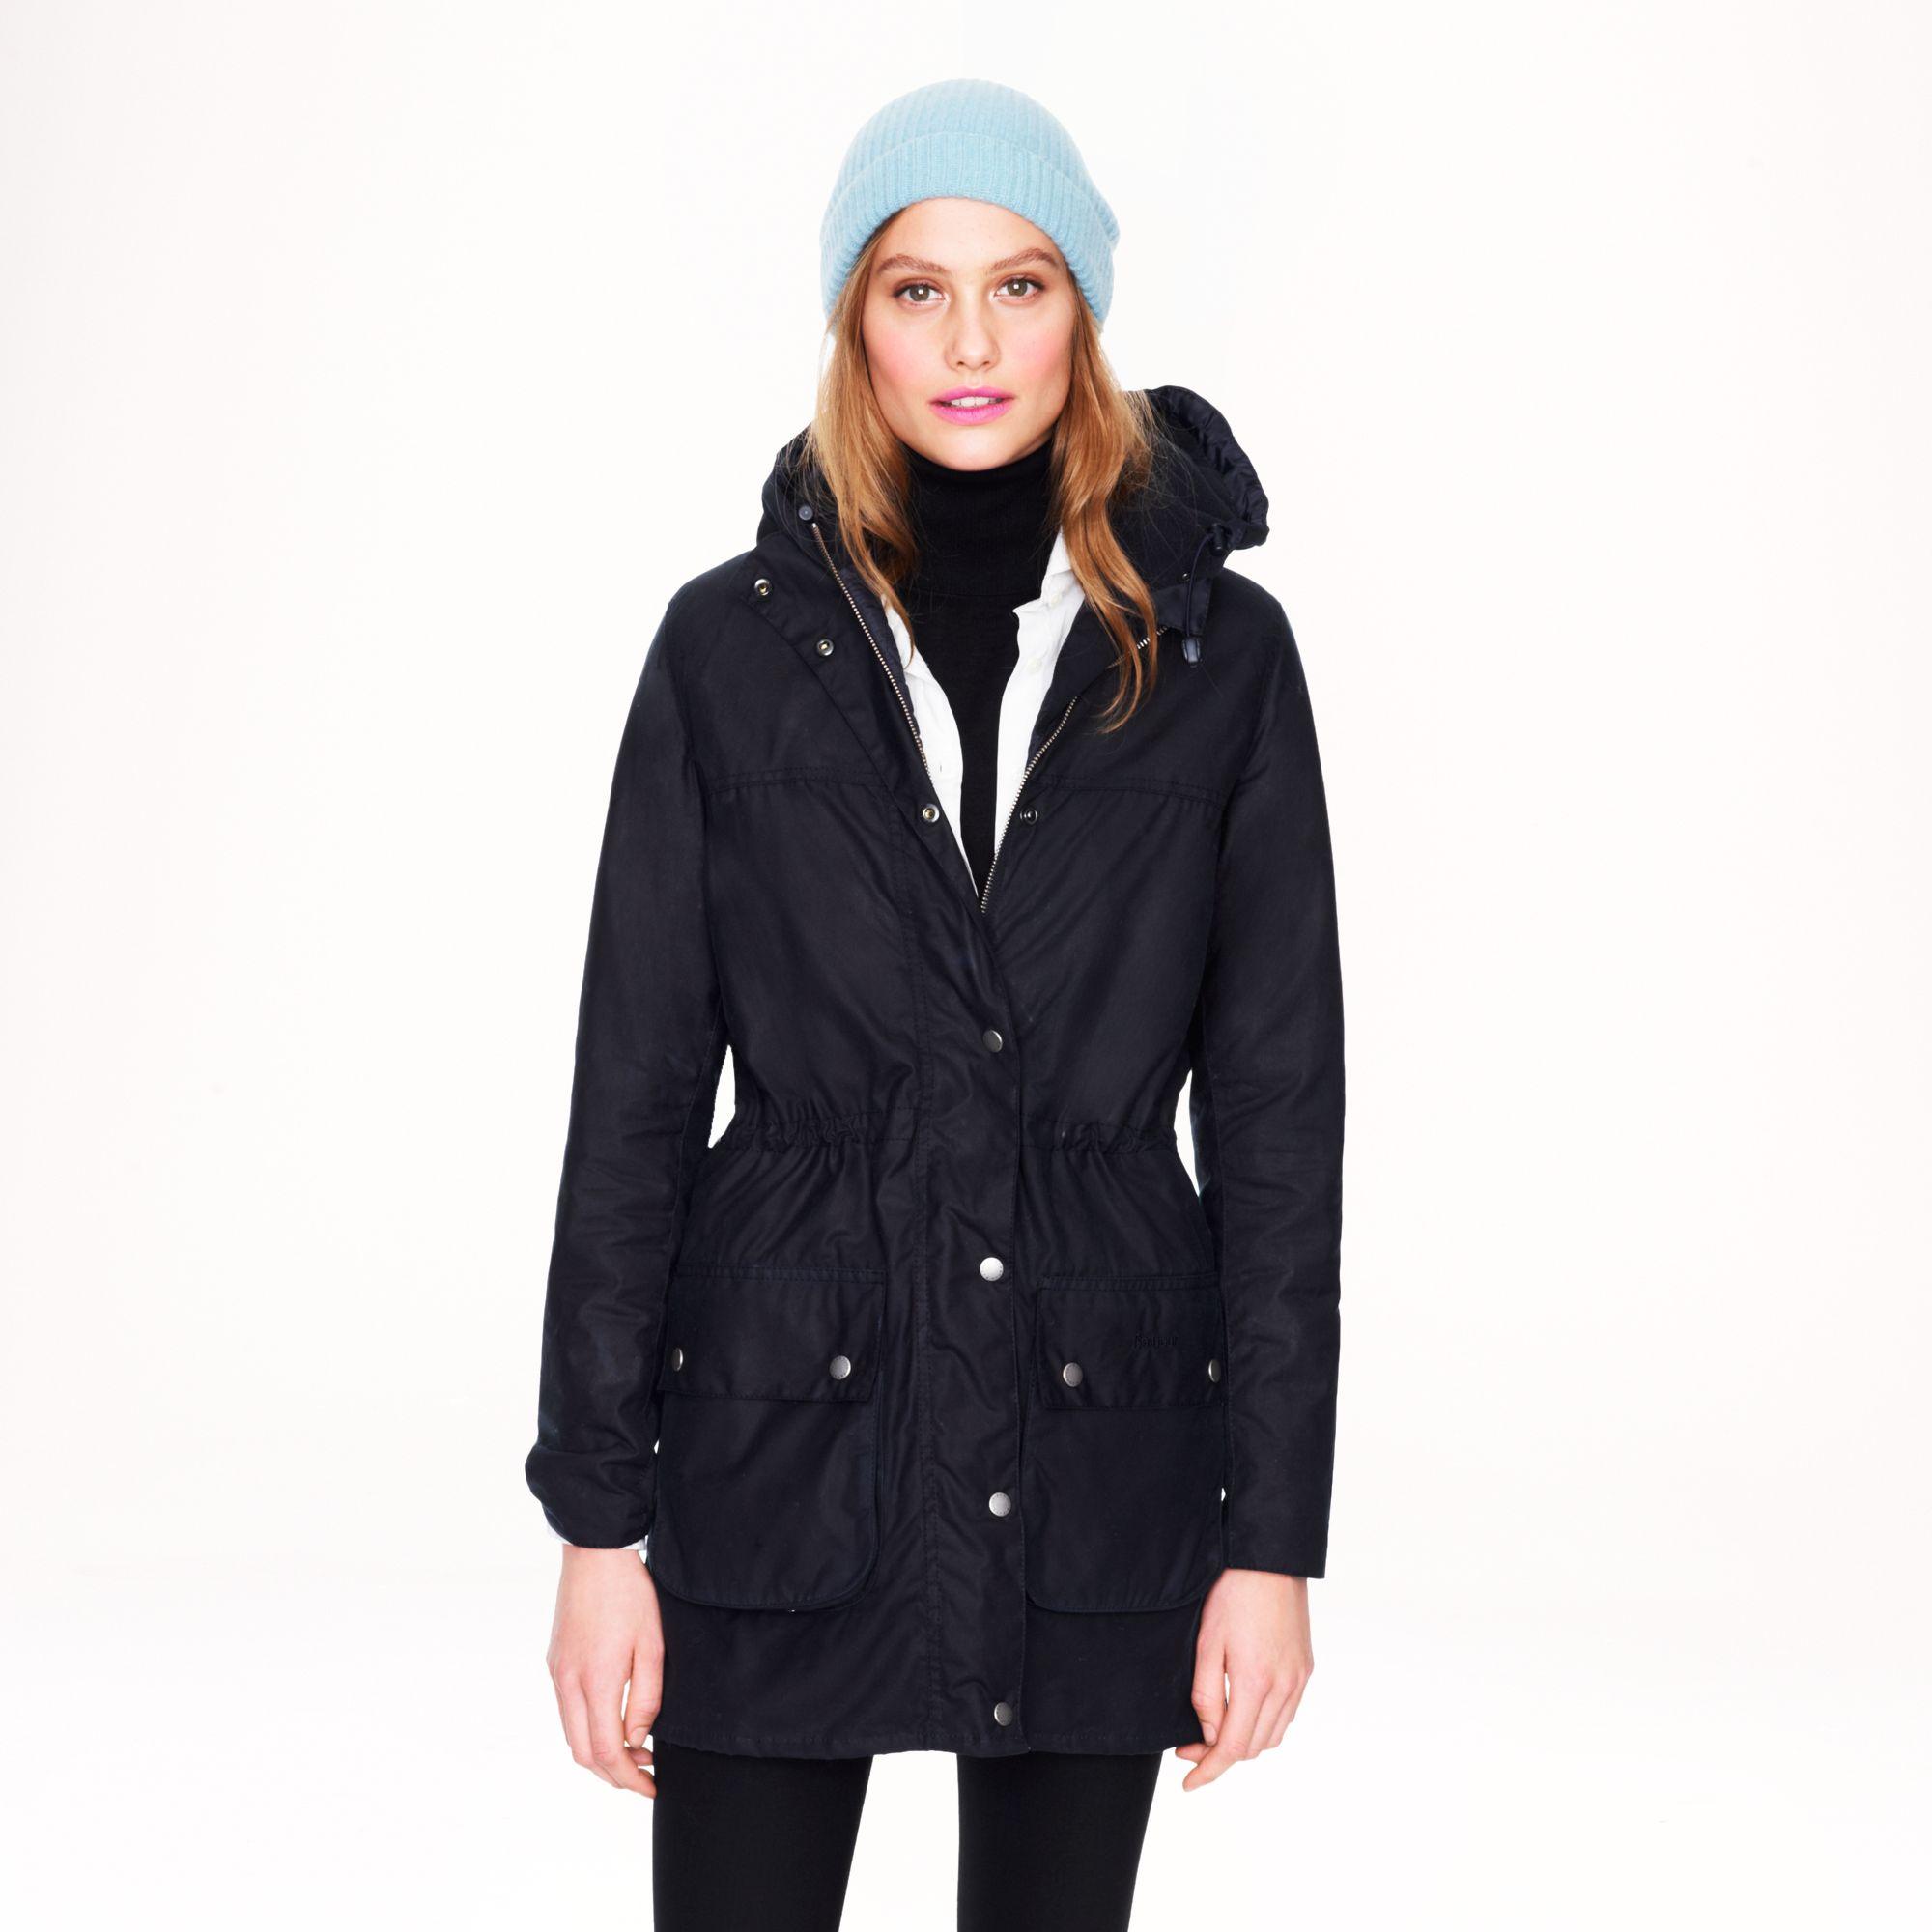 jew barbour winter durham jacket in blue lyst #0: jcrew navy barbour winter durham jacket product 1